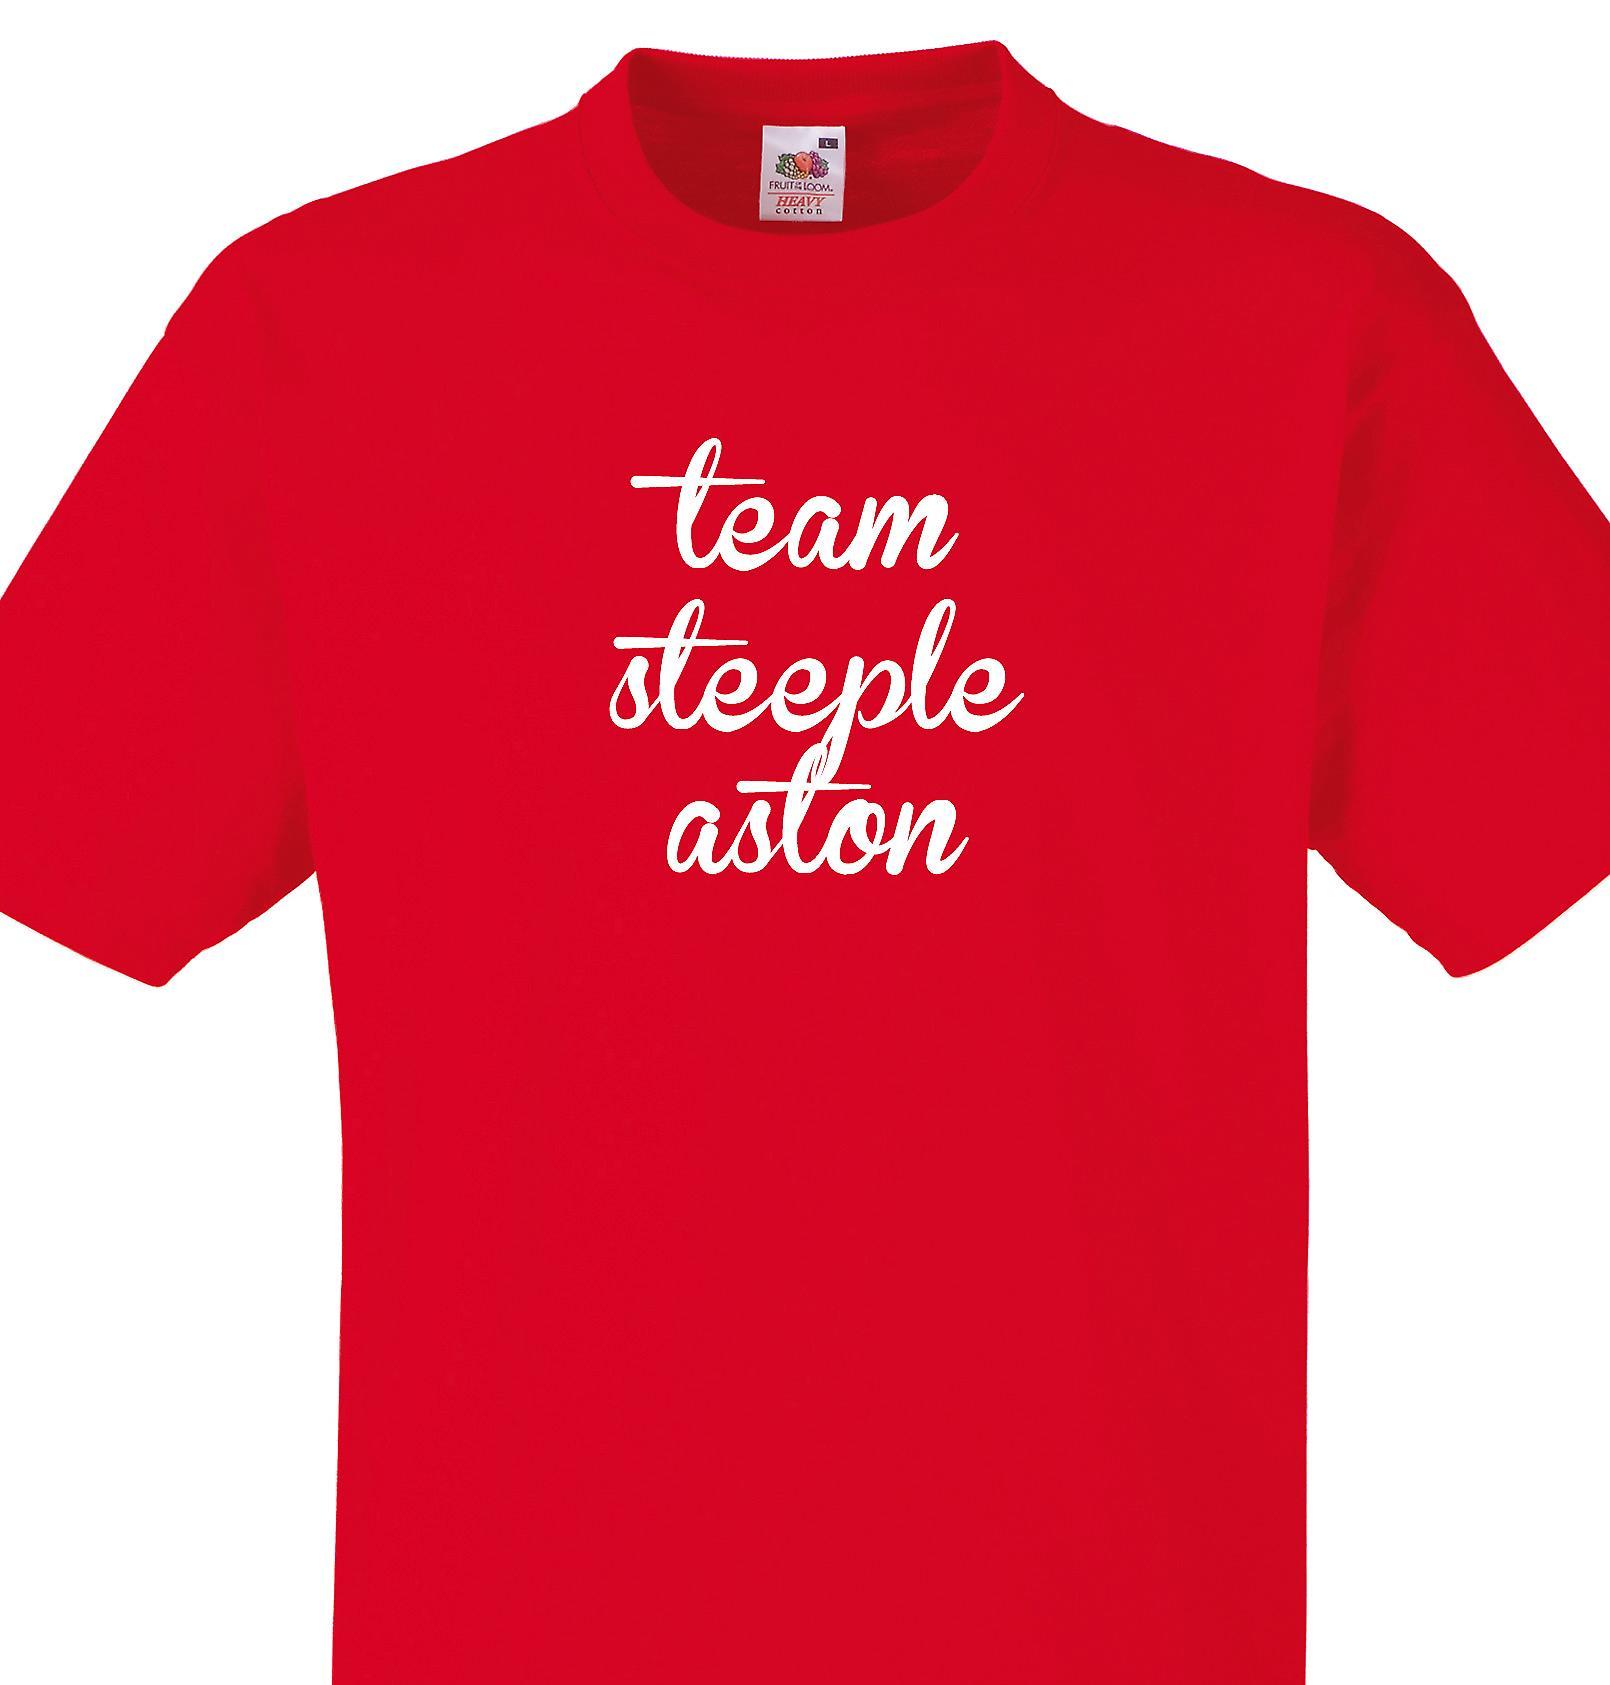 Team Steeple aston Red T shirt